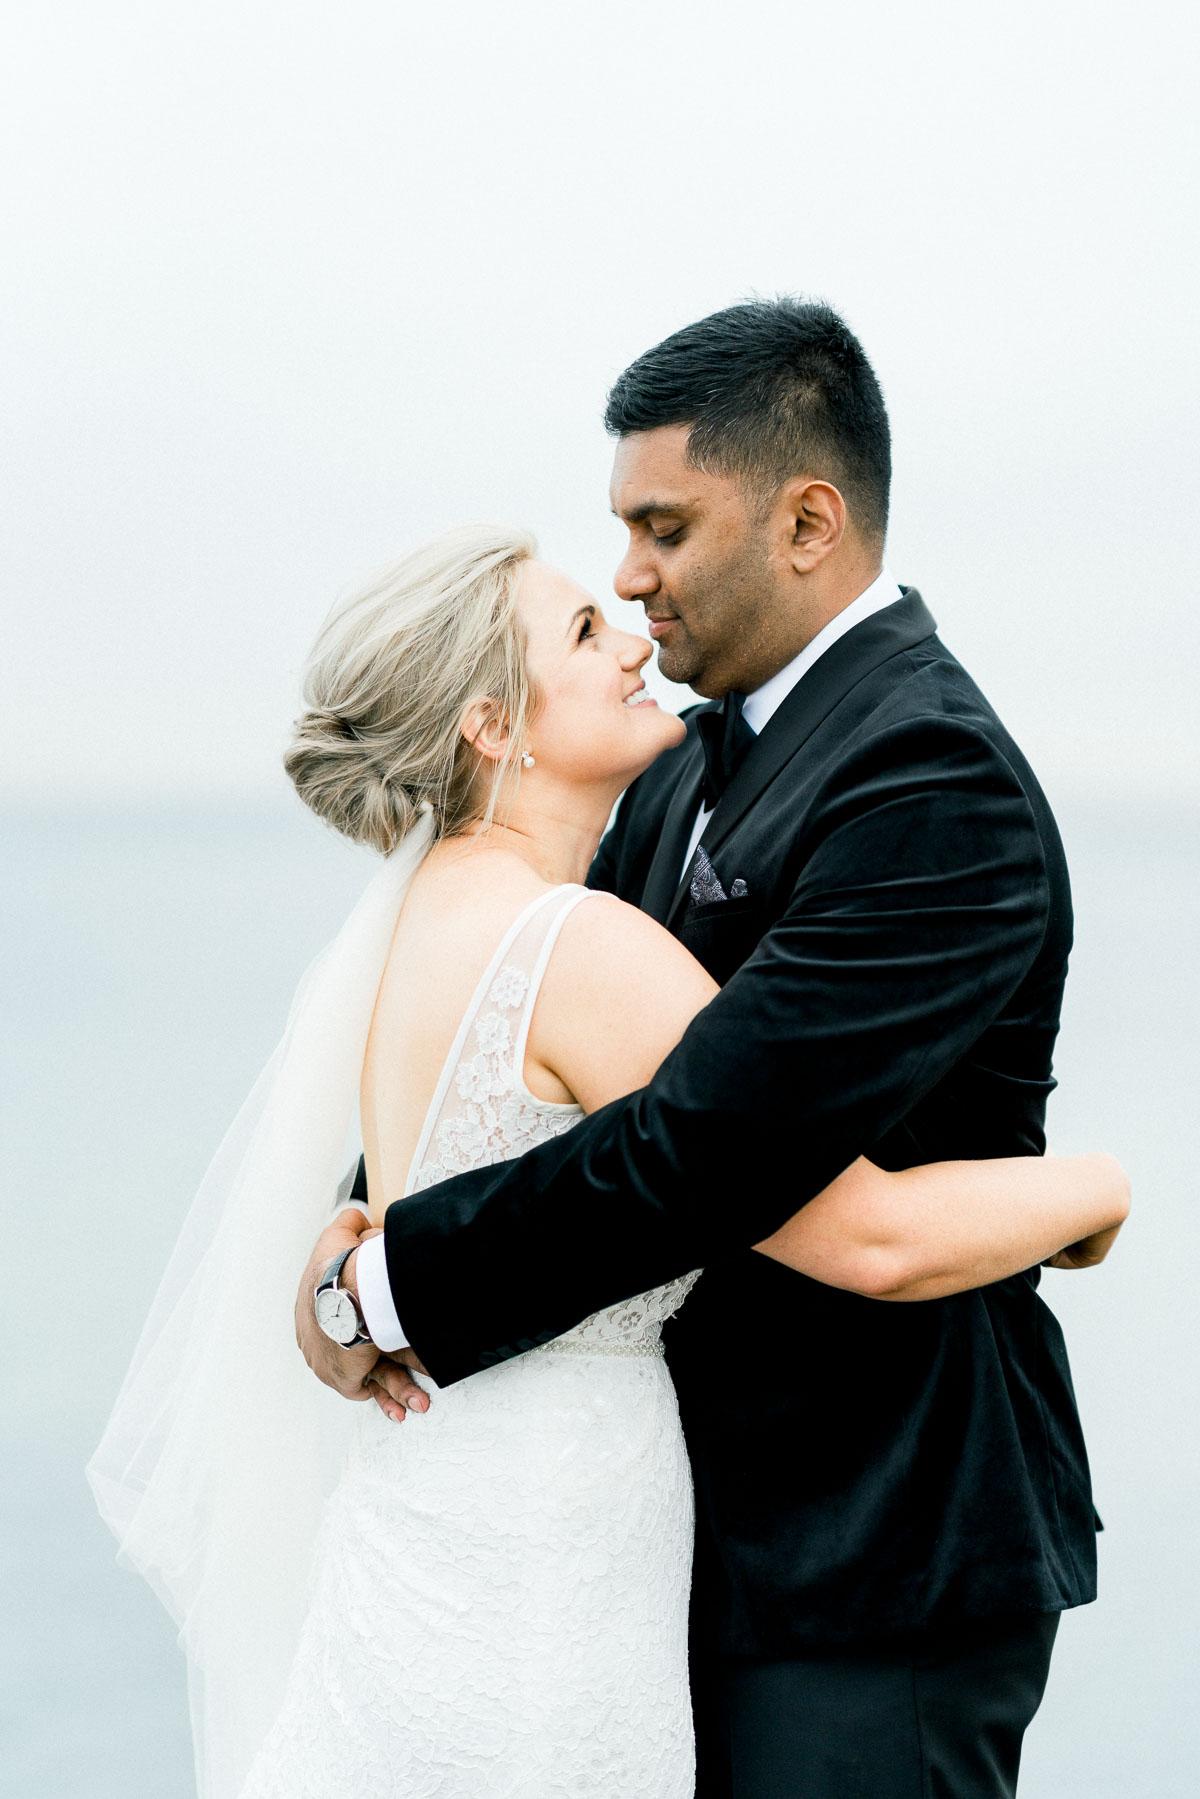 trenavin-chapel-phillip-island-wedding-heart+soul-weddings-sally-sean-01794.jpg